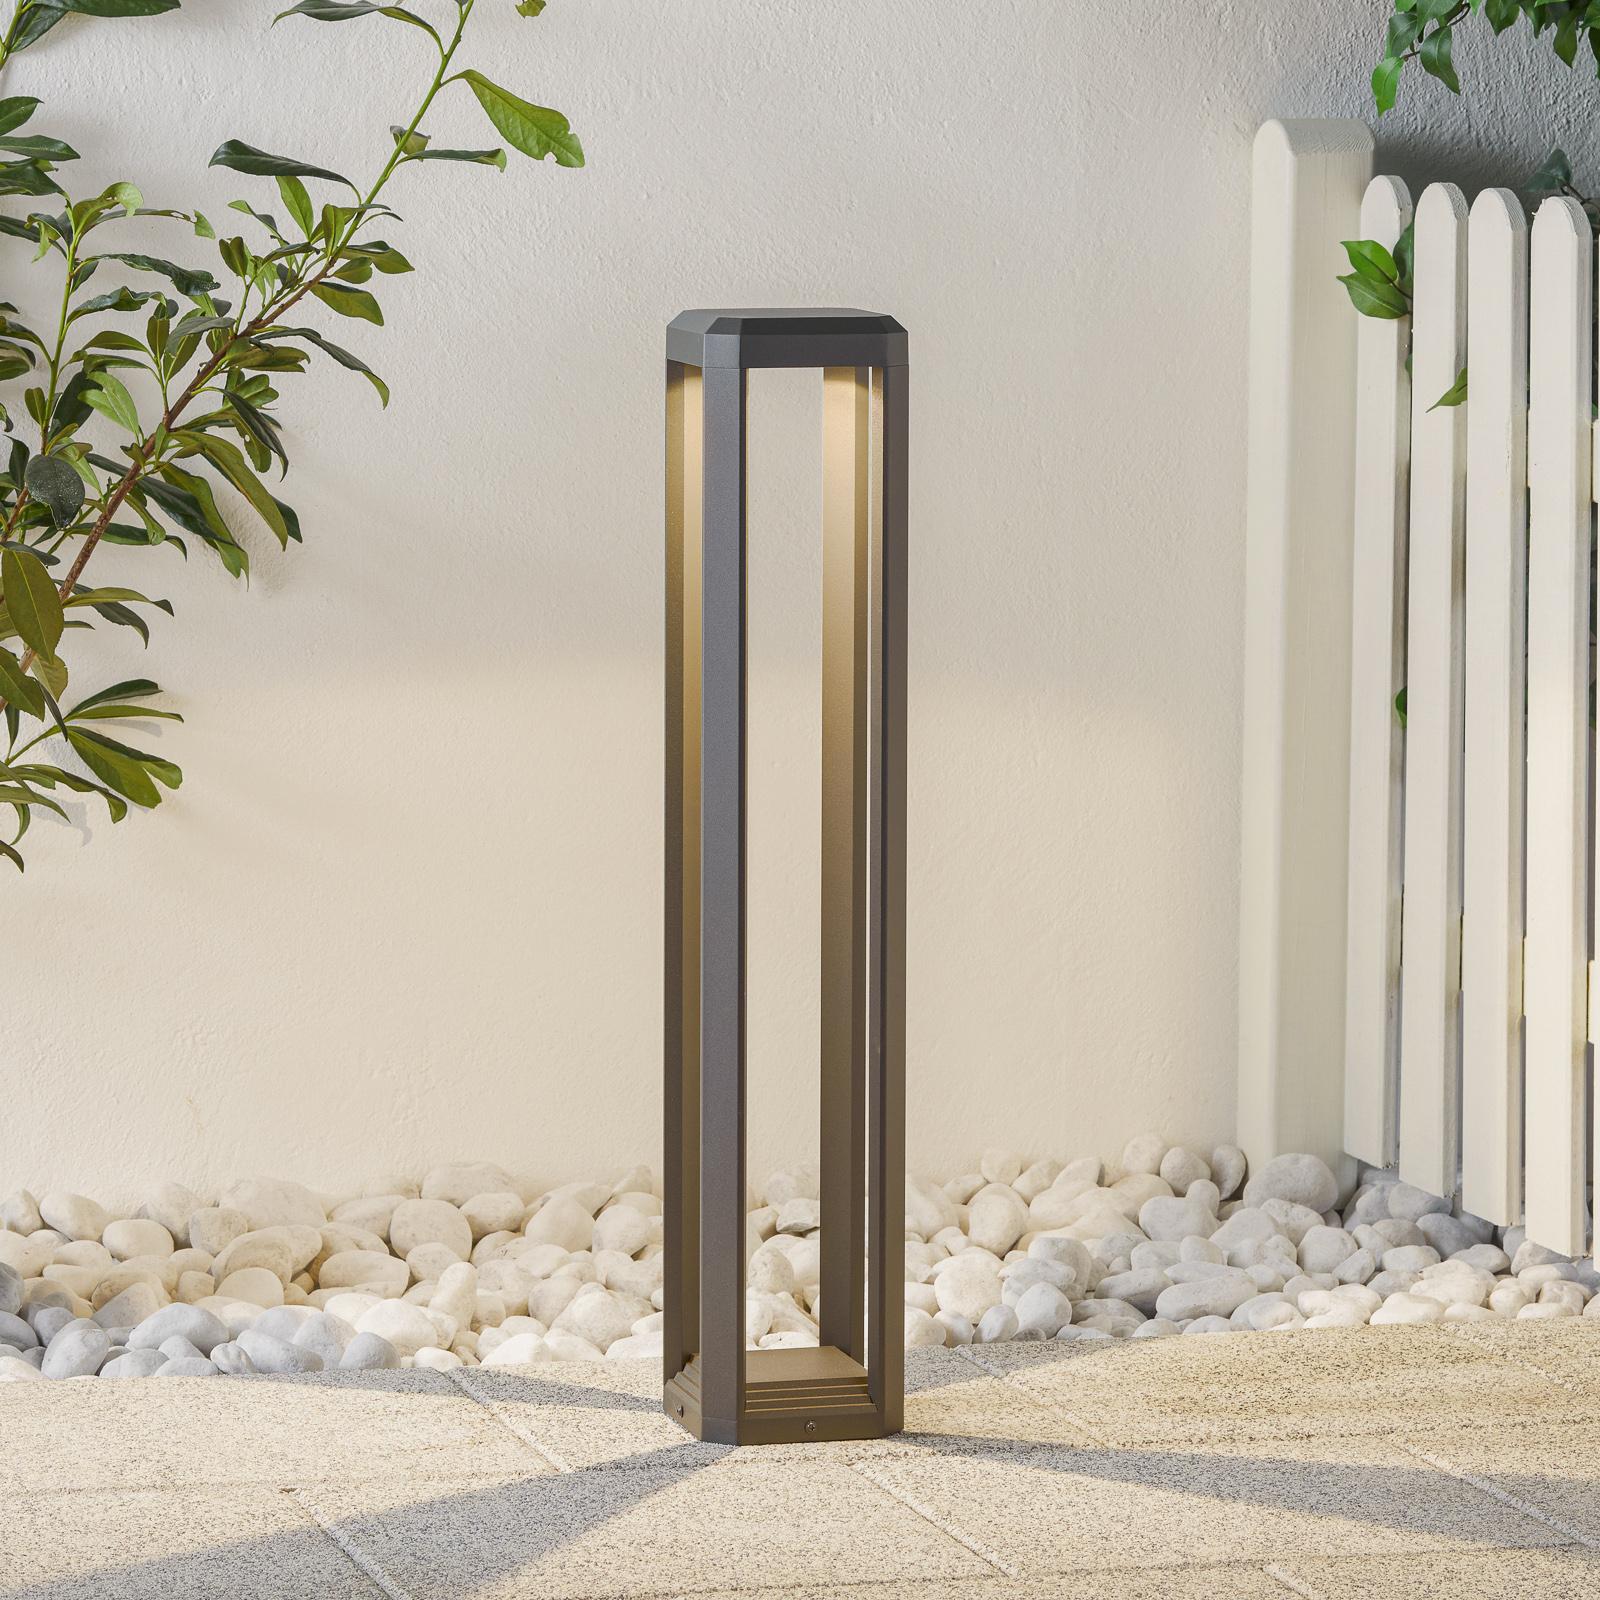 LED-pylväsvalaisin Logone - korkeus 80 cm